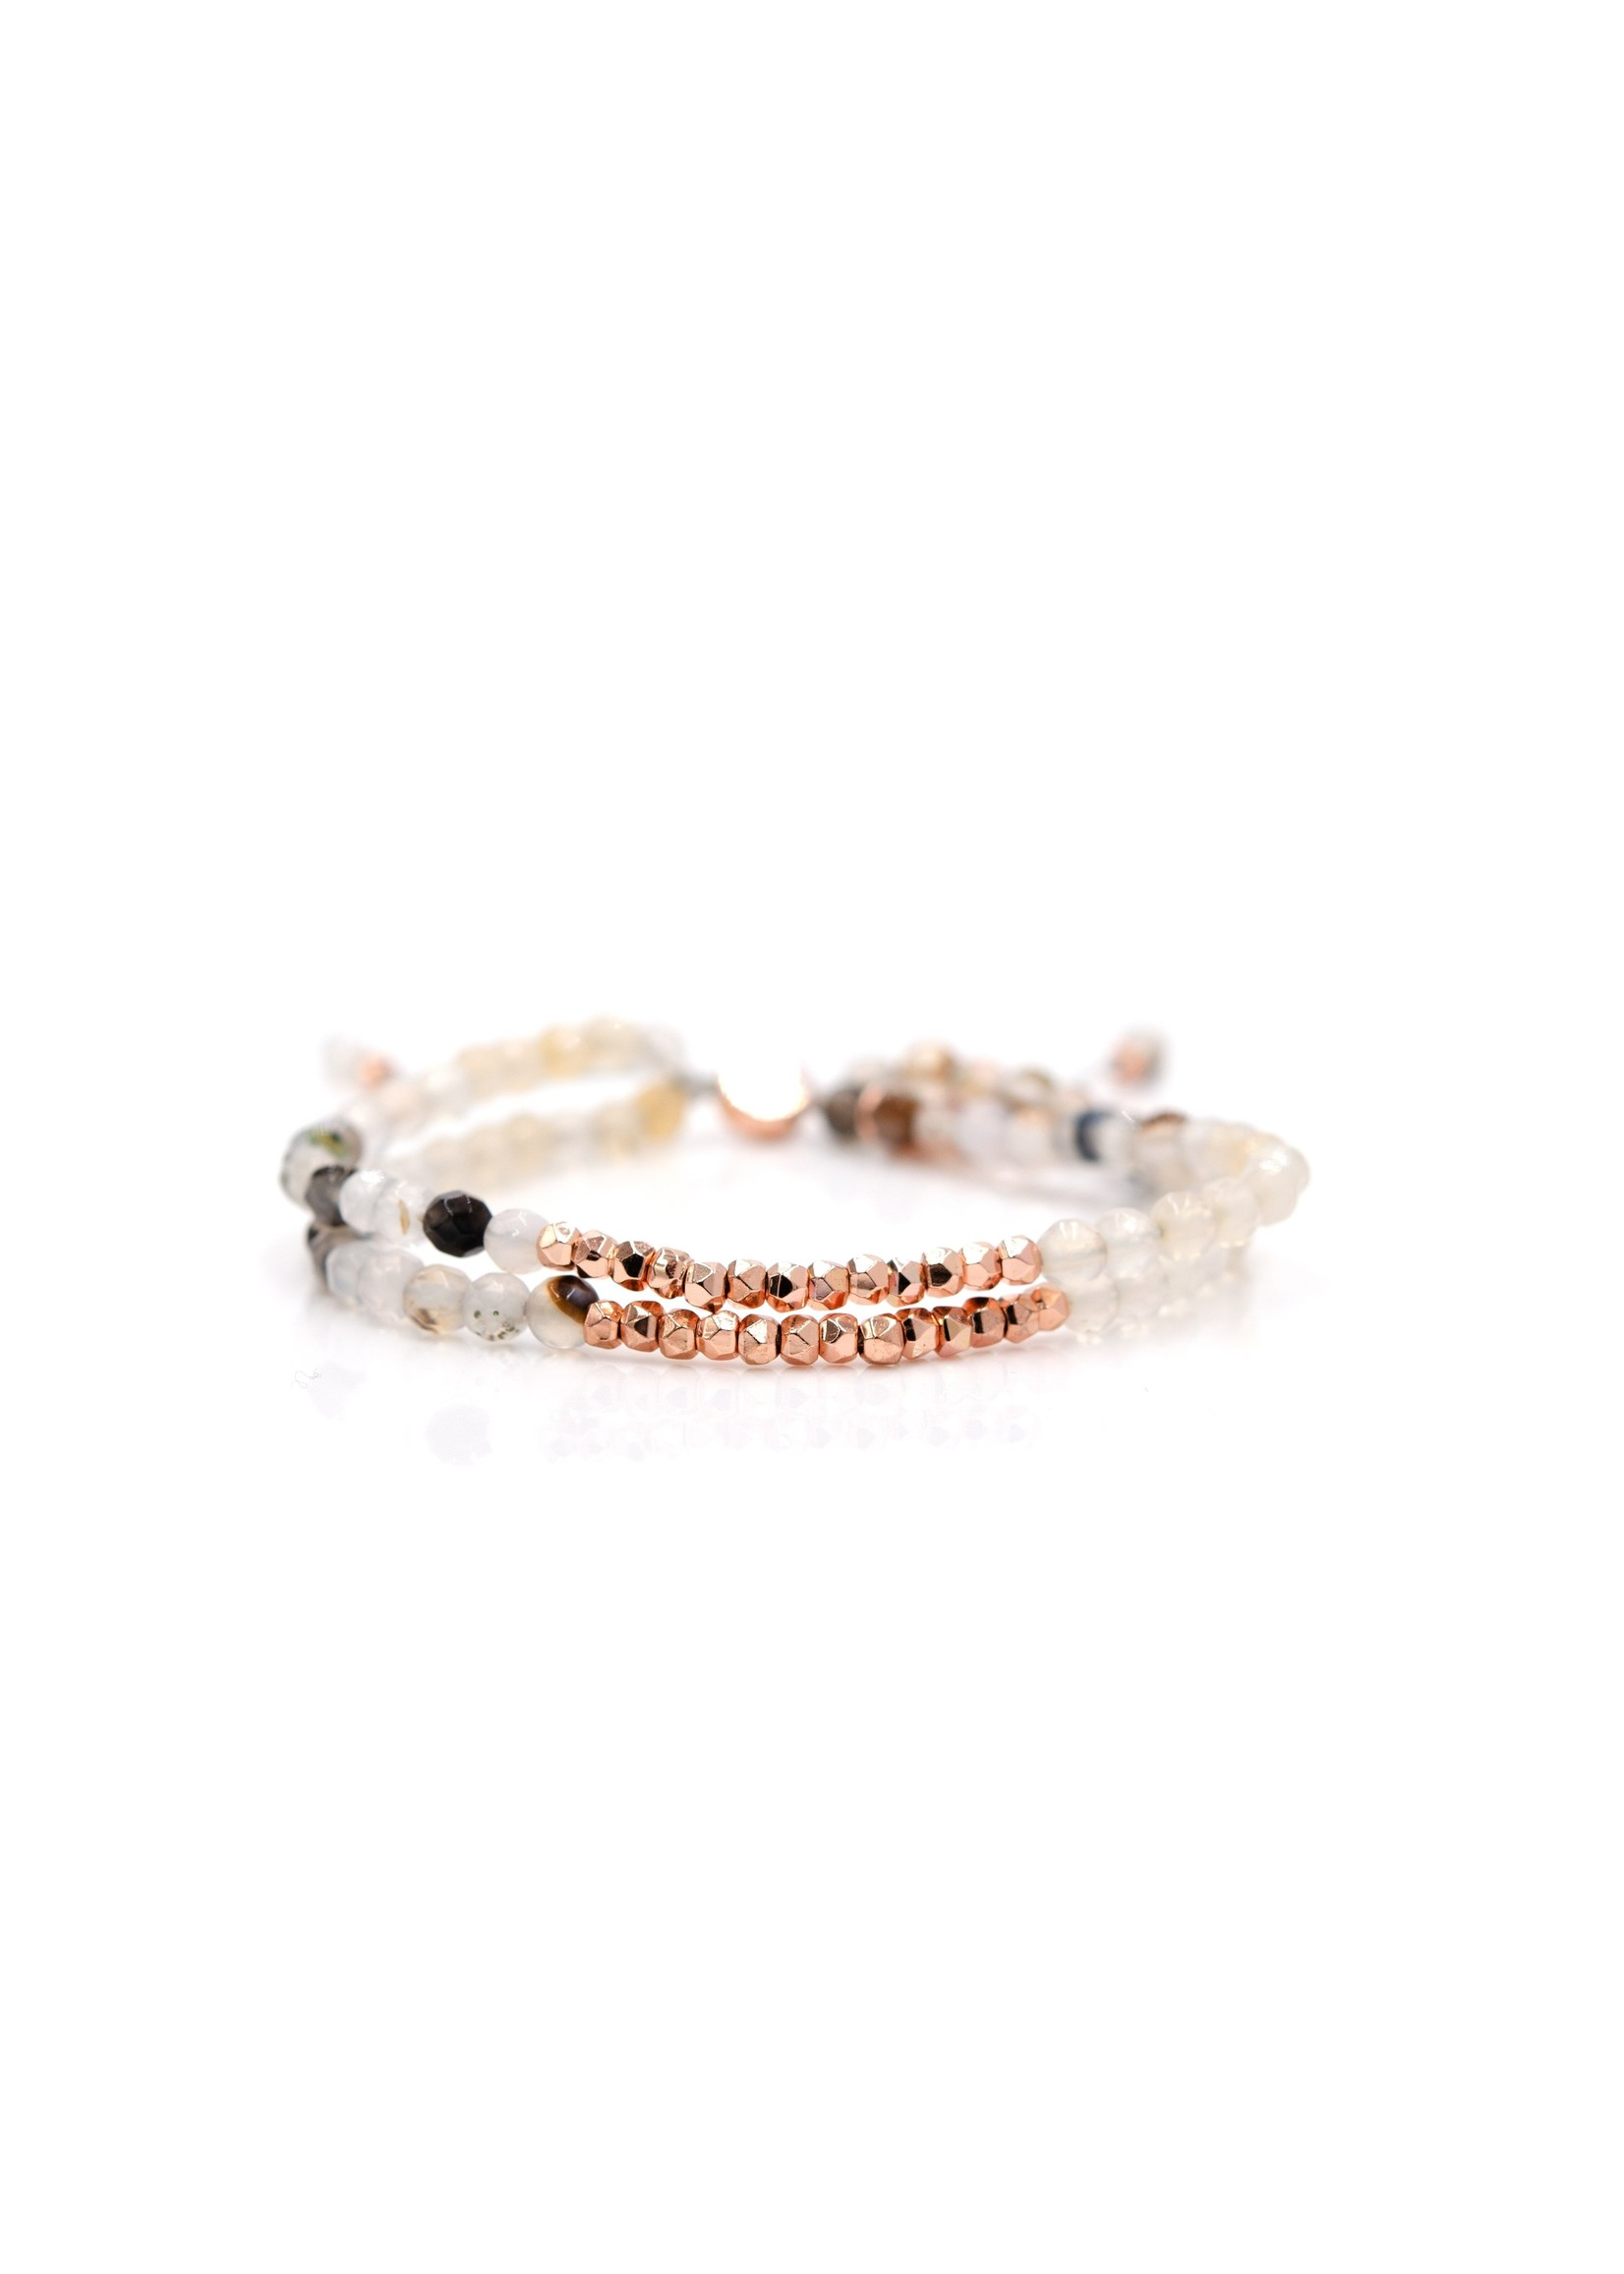 Ocean Eye Doublestrand Bangin Bracelet